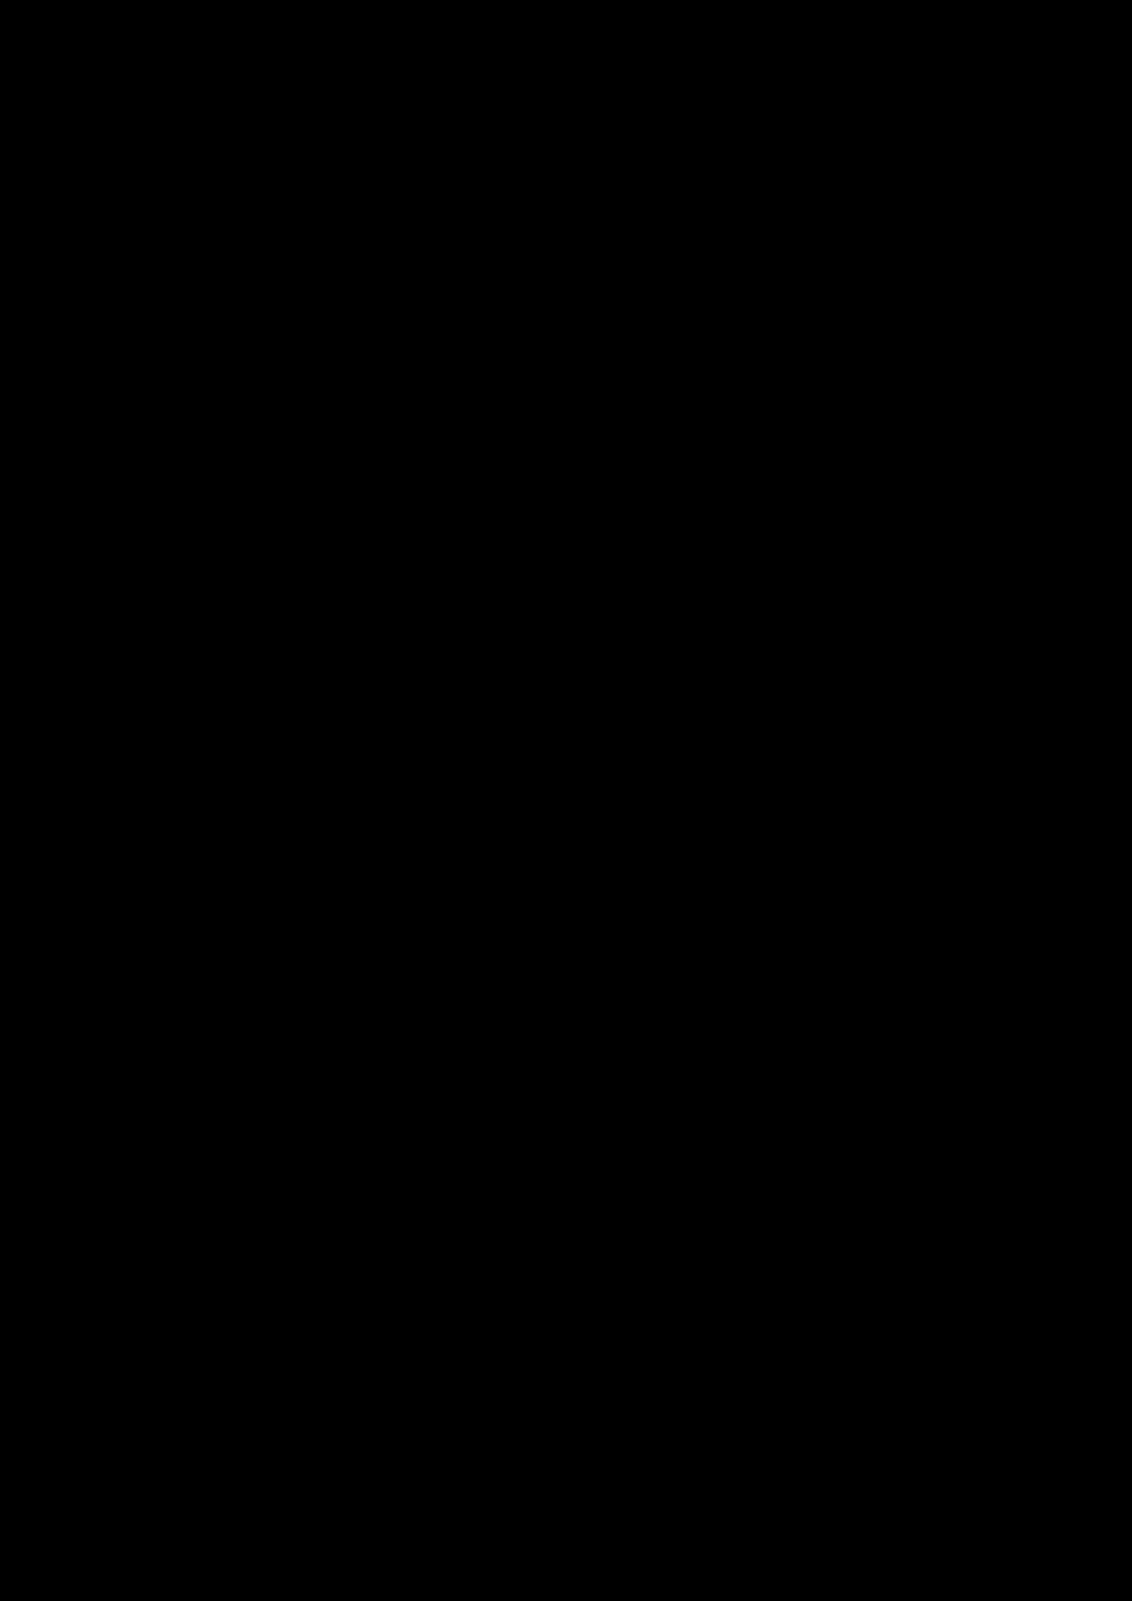 Belyiy sokol slide, Image 95